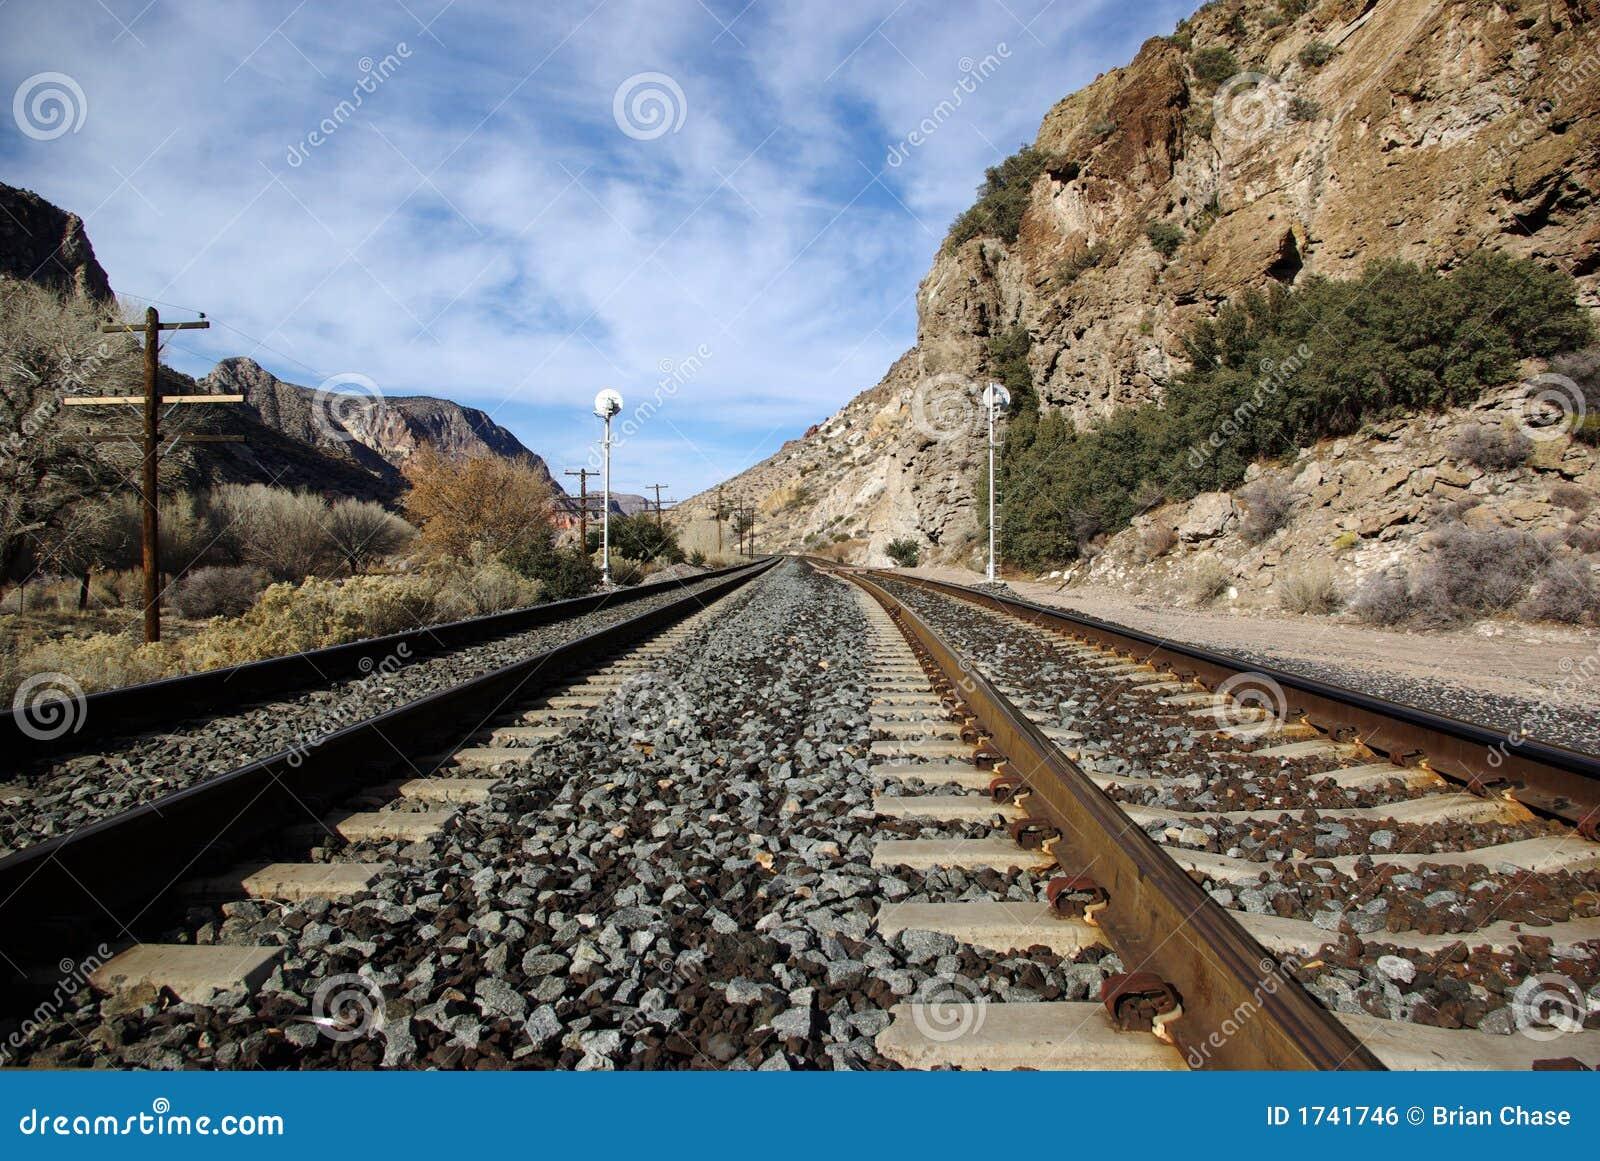 Railroad Tracks Royalty Free Stock Image - Image: 1741746